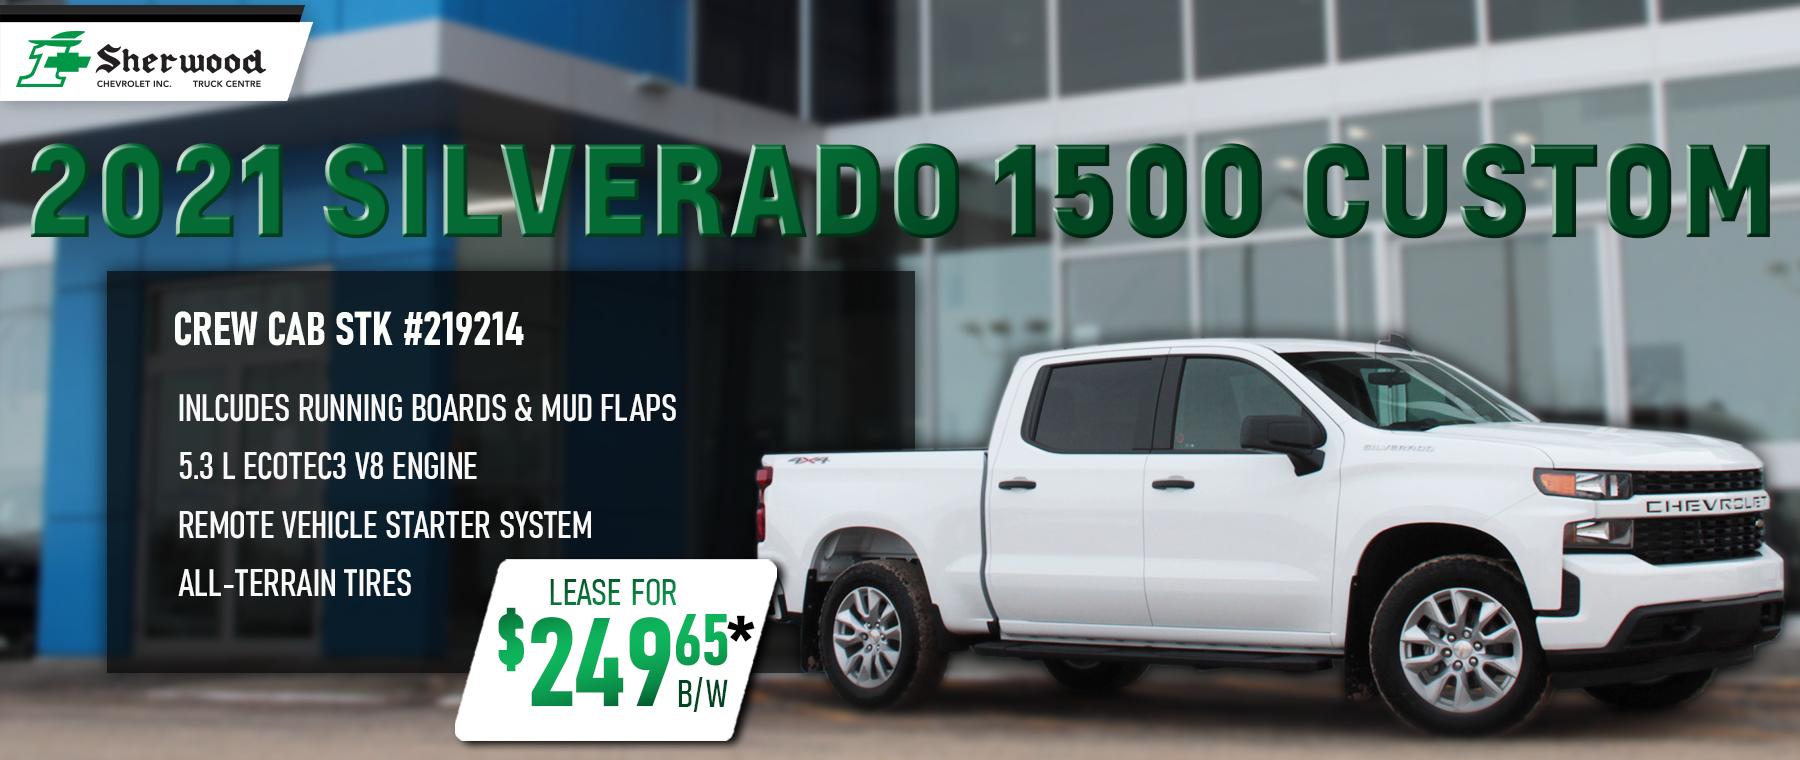 2021 White Chevrolet Silverado 1500